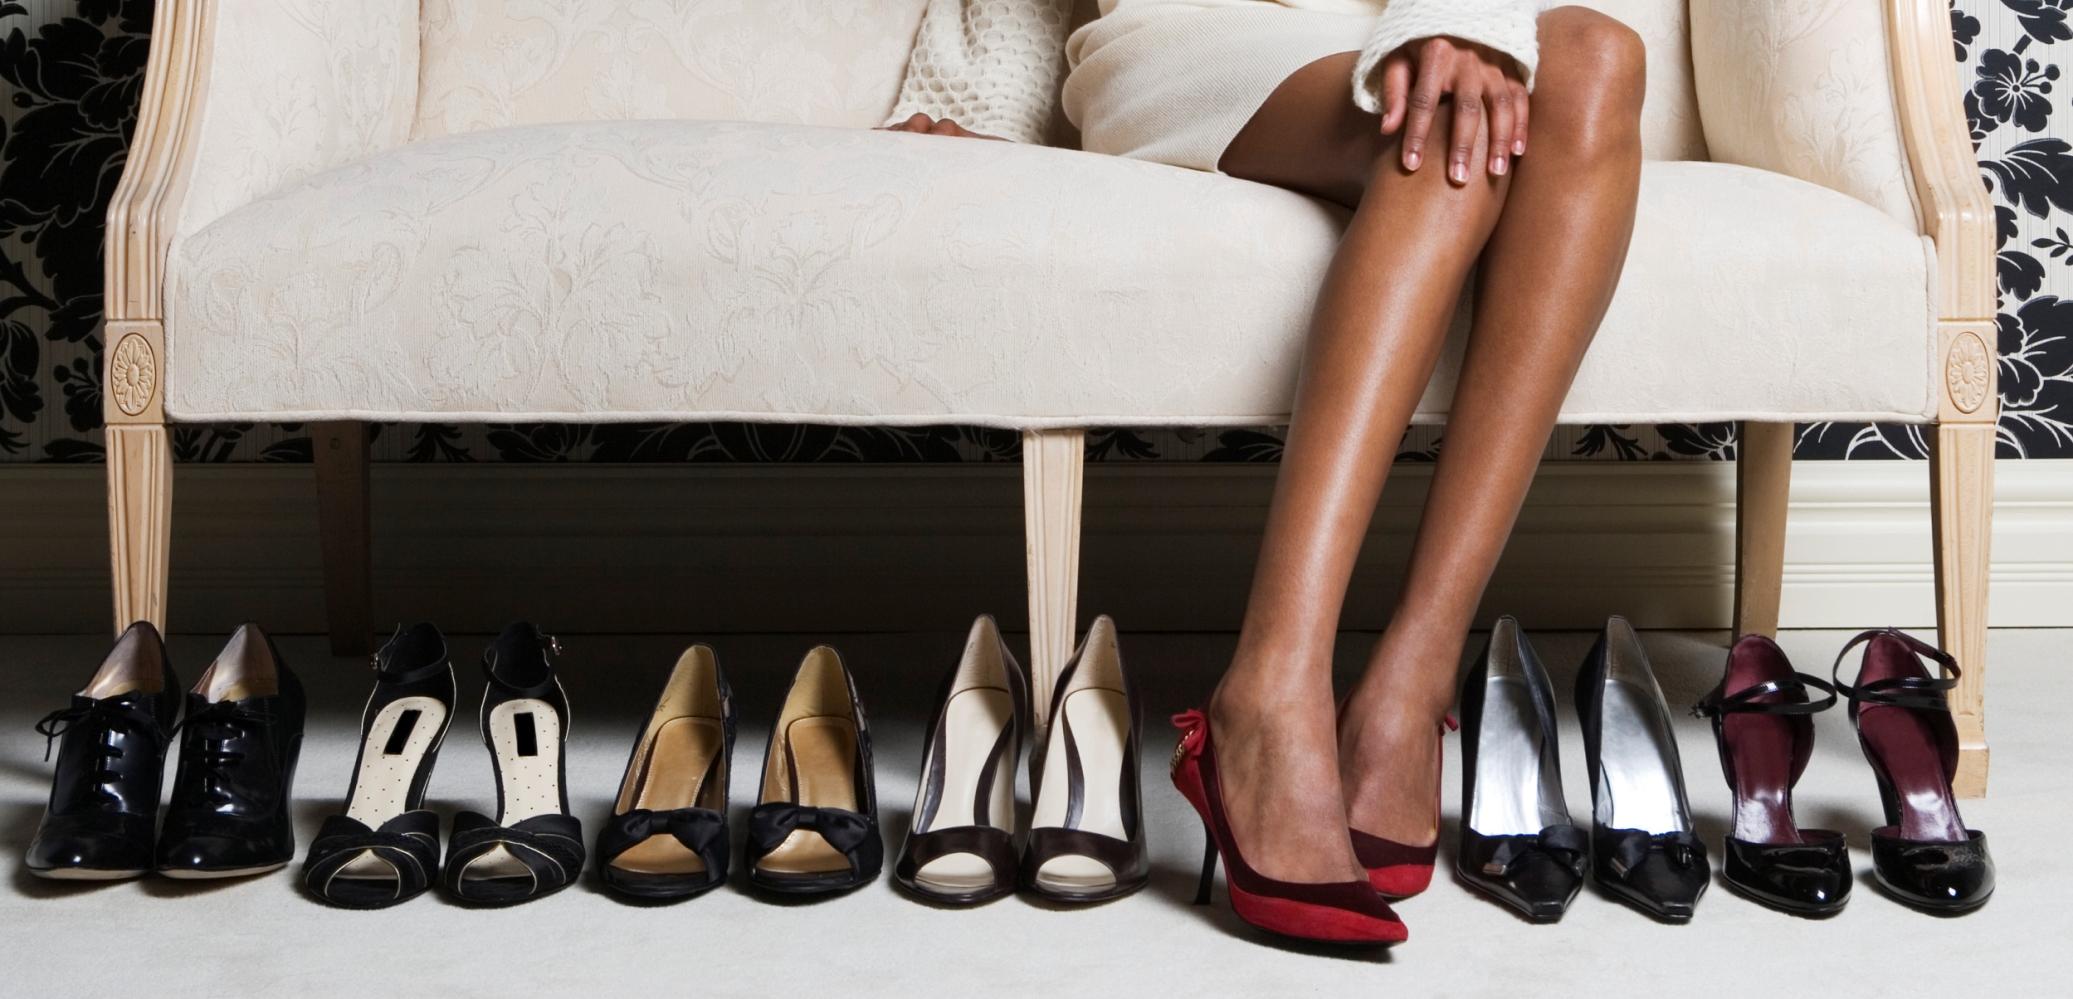 Туфли на каблуках мода фото